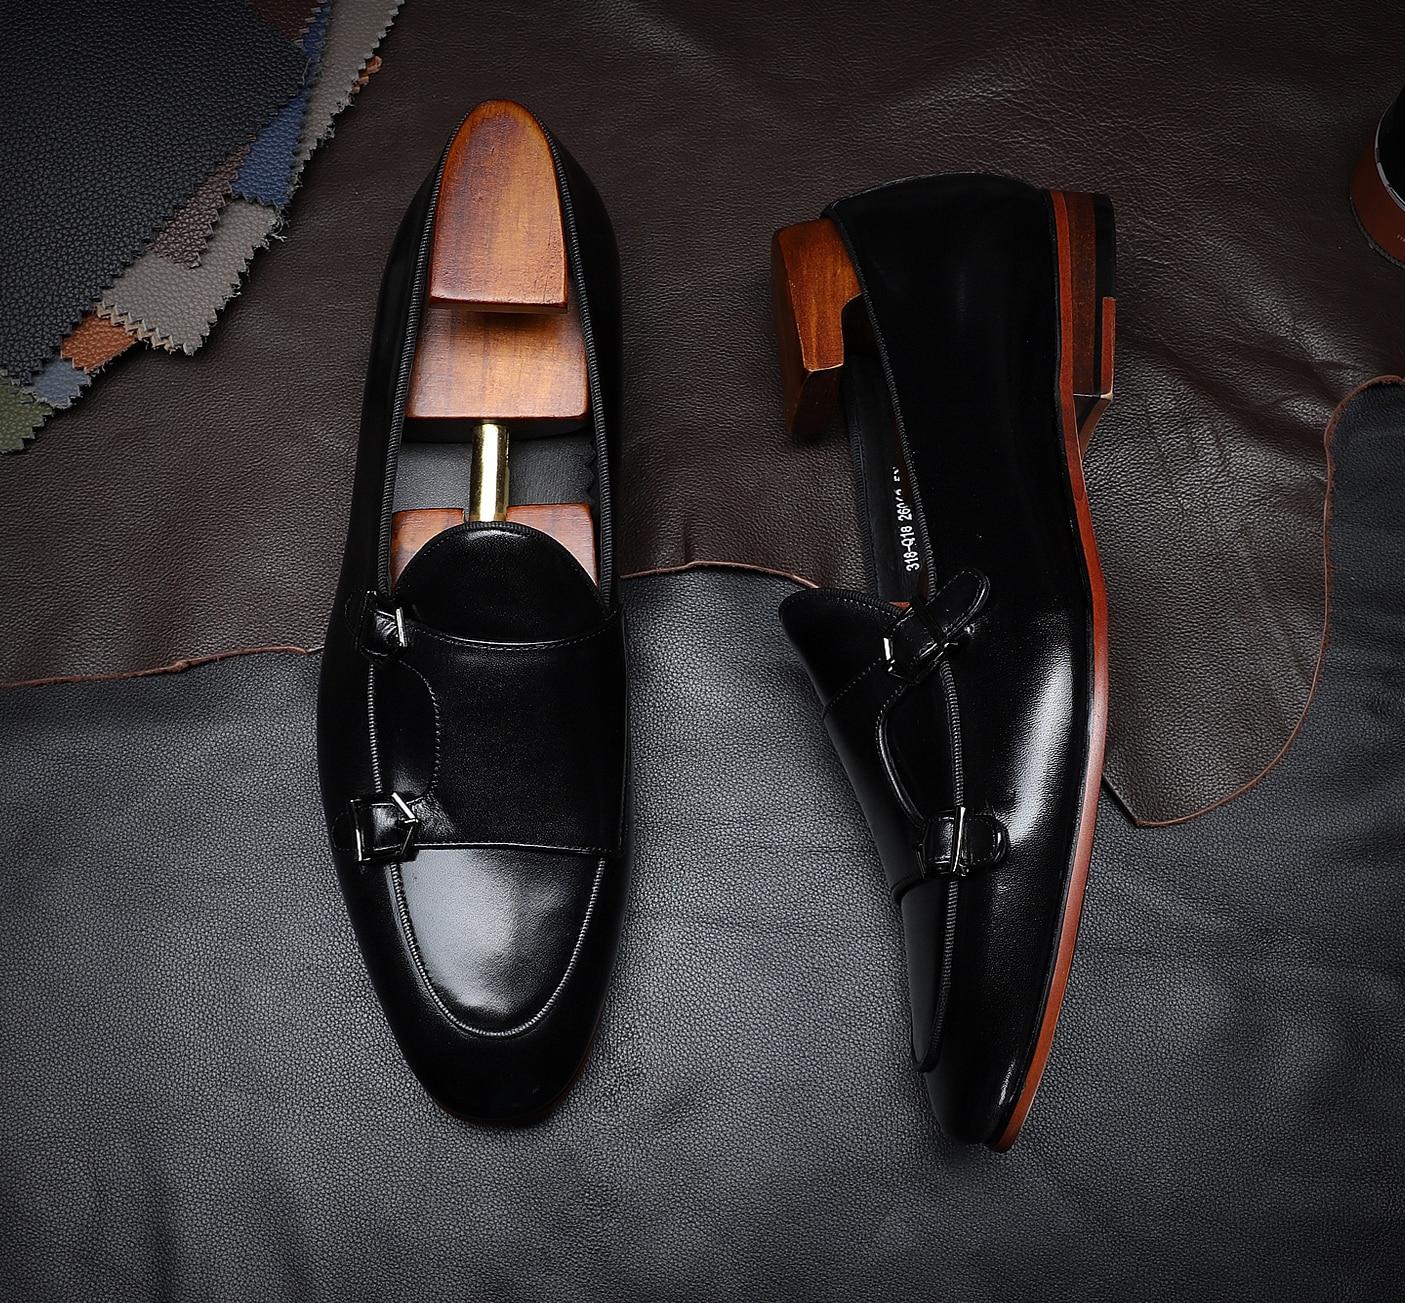 Hanmce موضة تصميم حقيقي أحذية من الجلد مشبك حزام الراهب حذاء رجالي